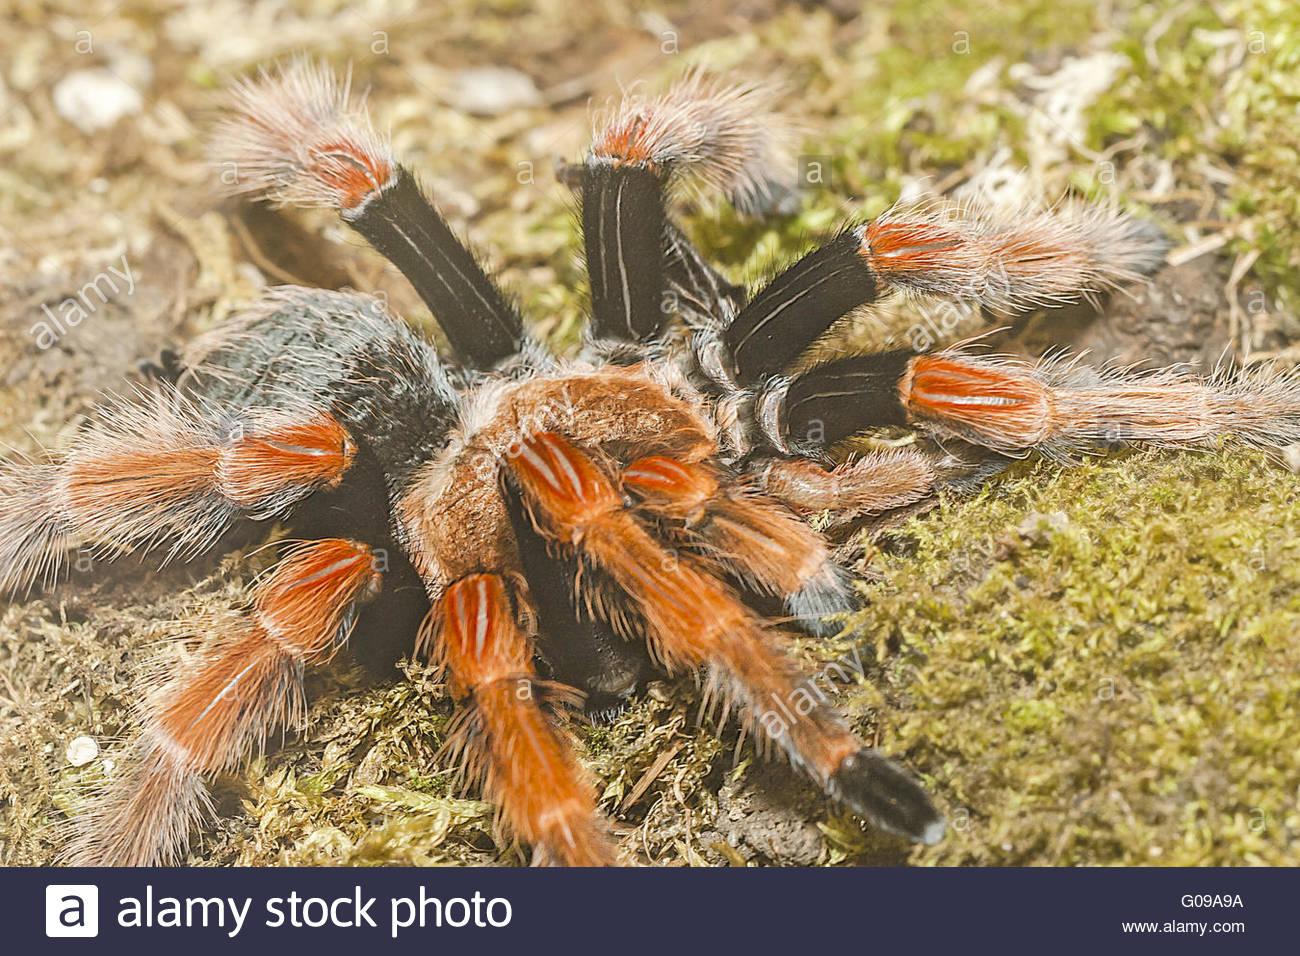 Fire Leg Tarantula (brachypelma bohemei) Mexico - Stock Image